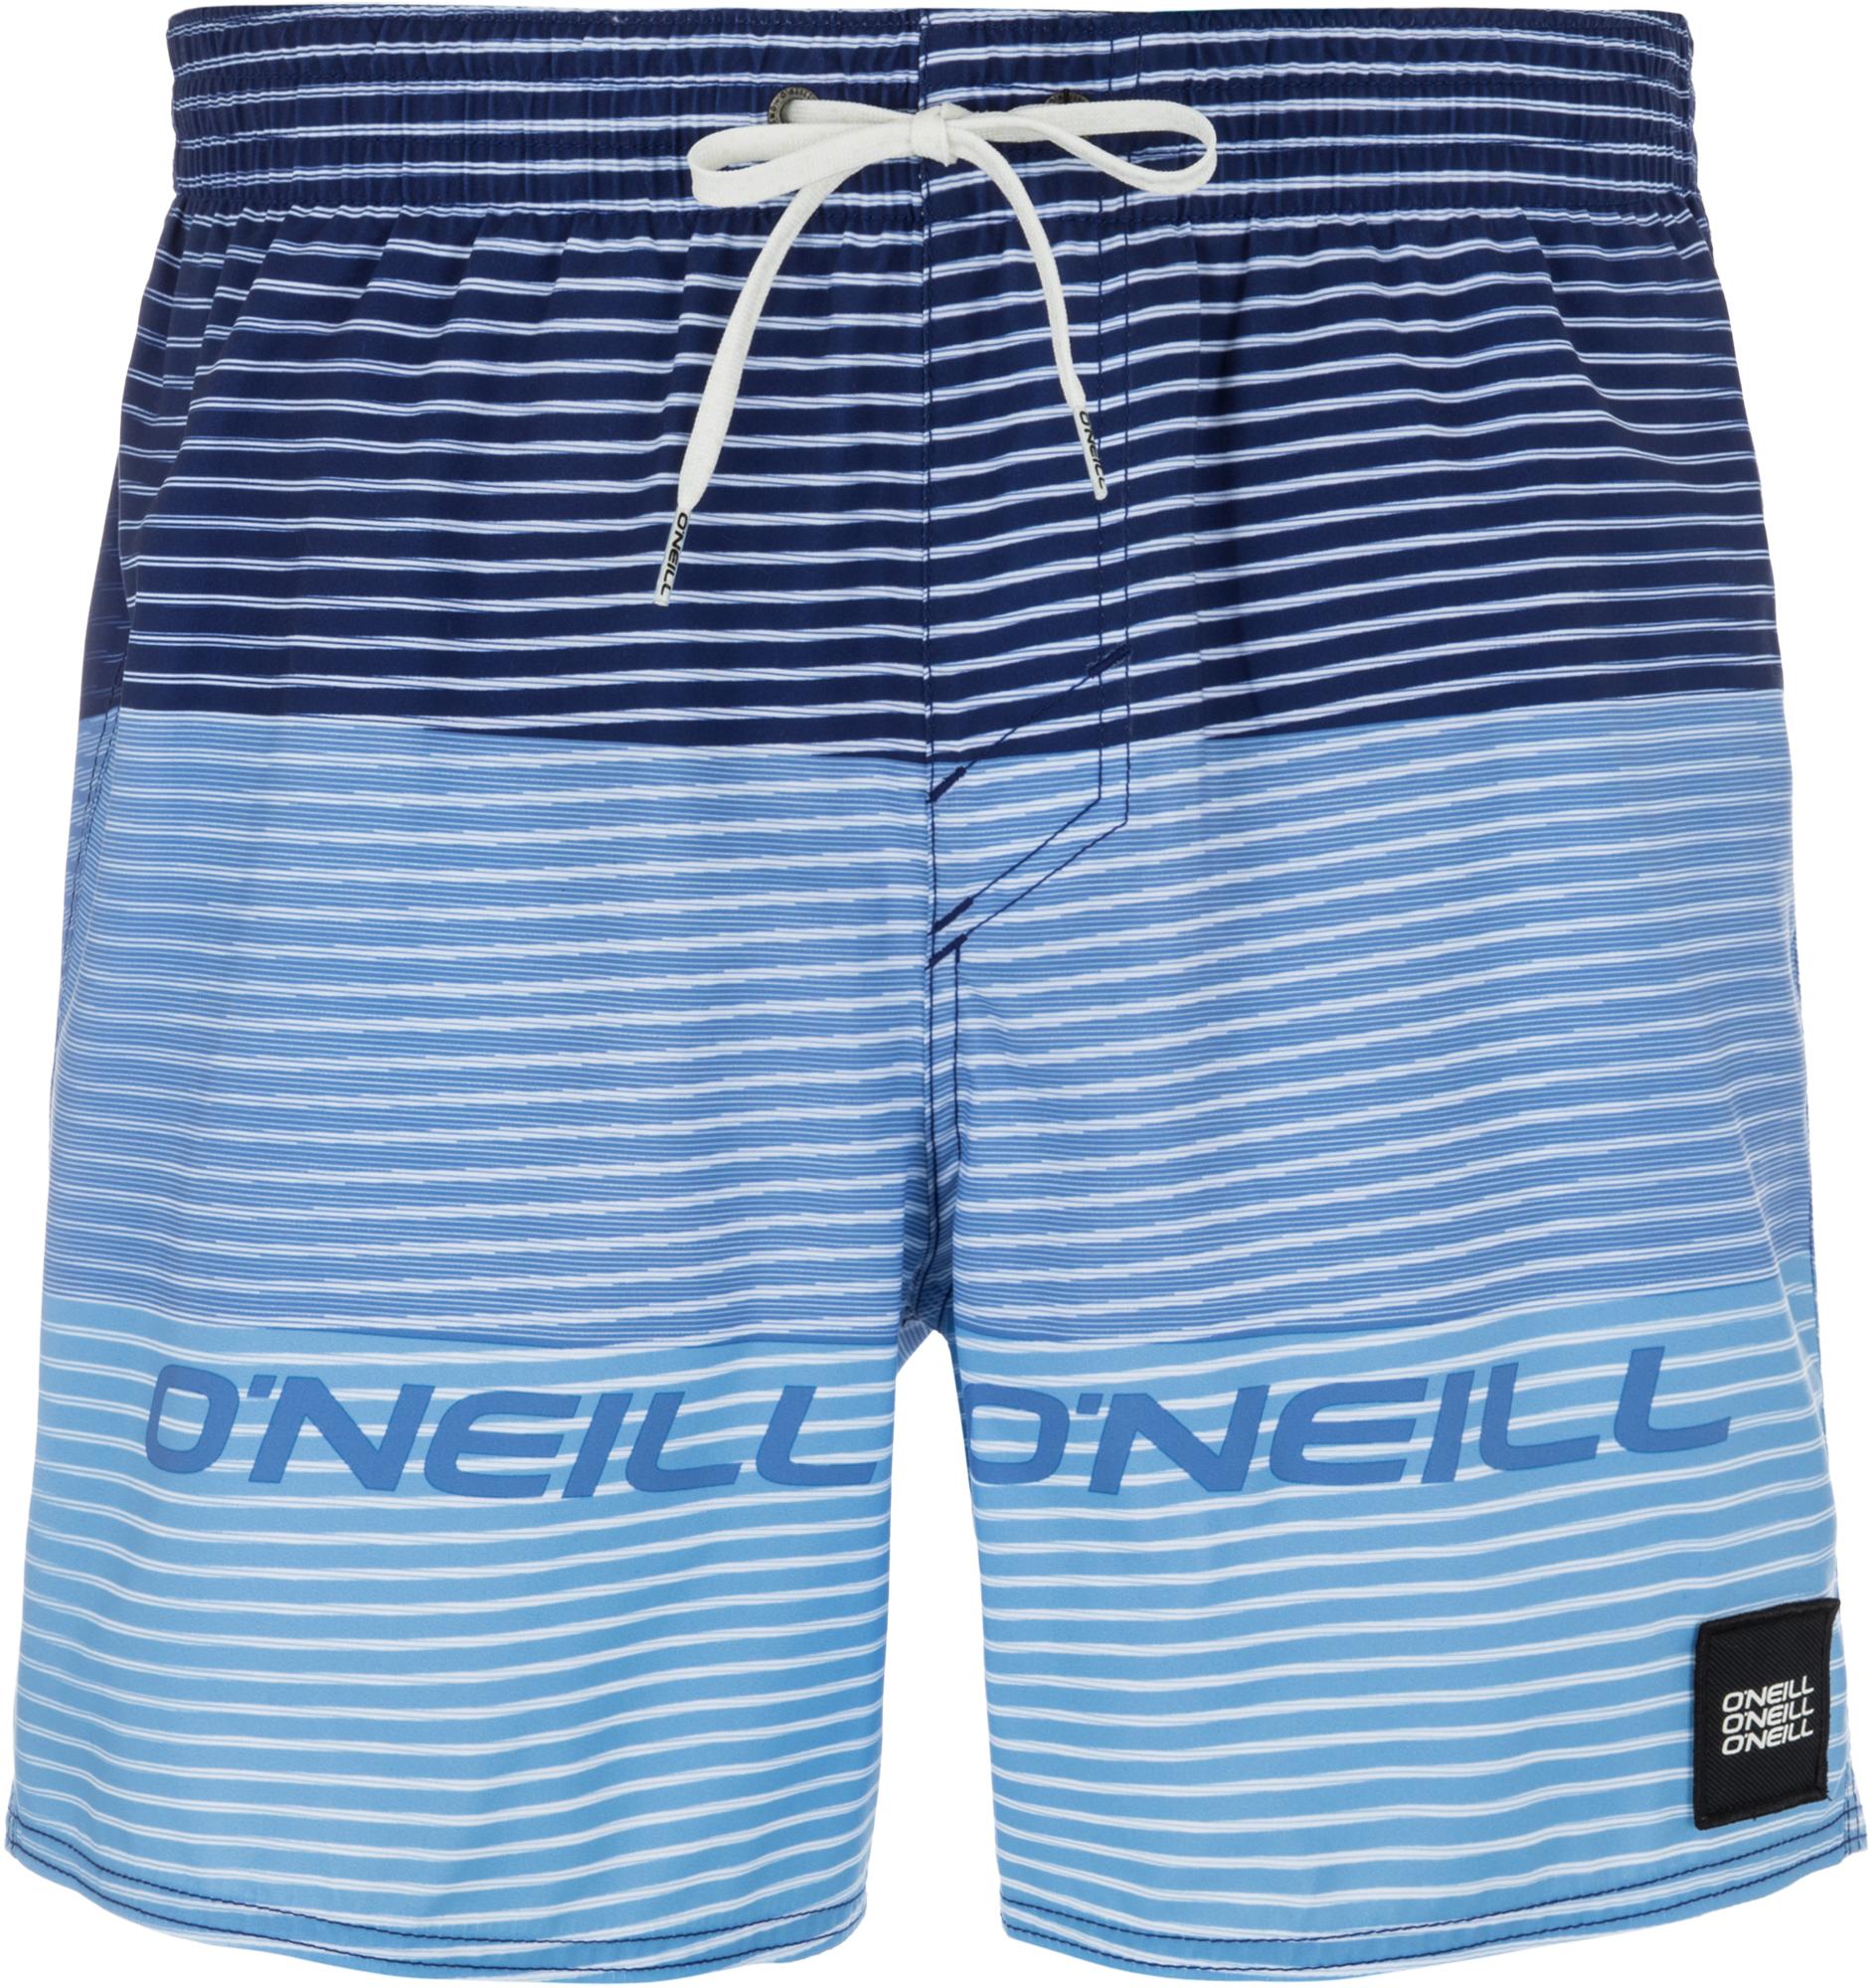 O'Neill Шорты пляжные мужские O'Neill Hm Sunstroke, размер 50-52 molo шорты пляжные nario рассвет